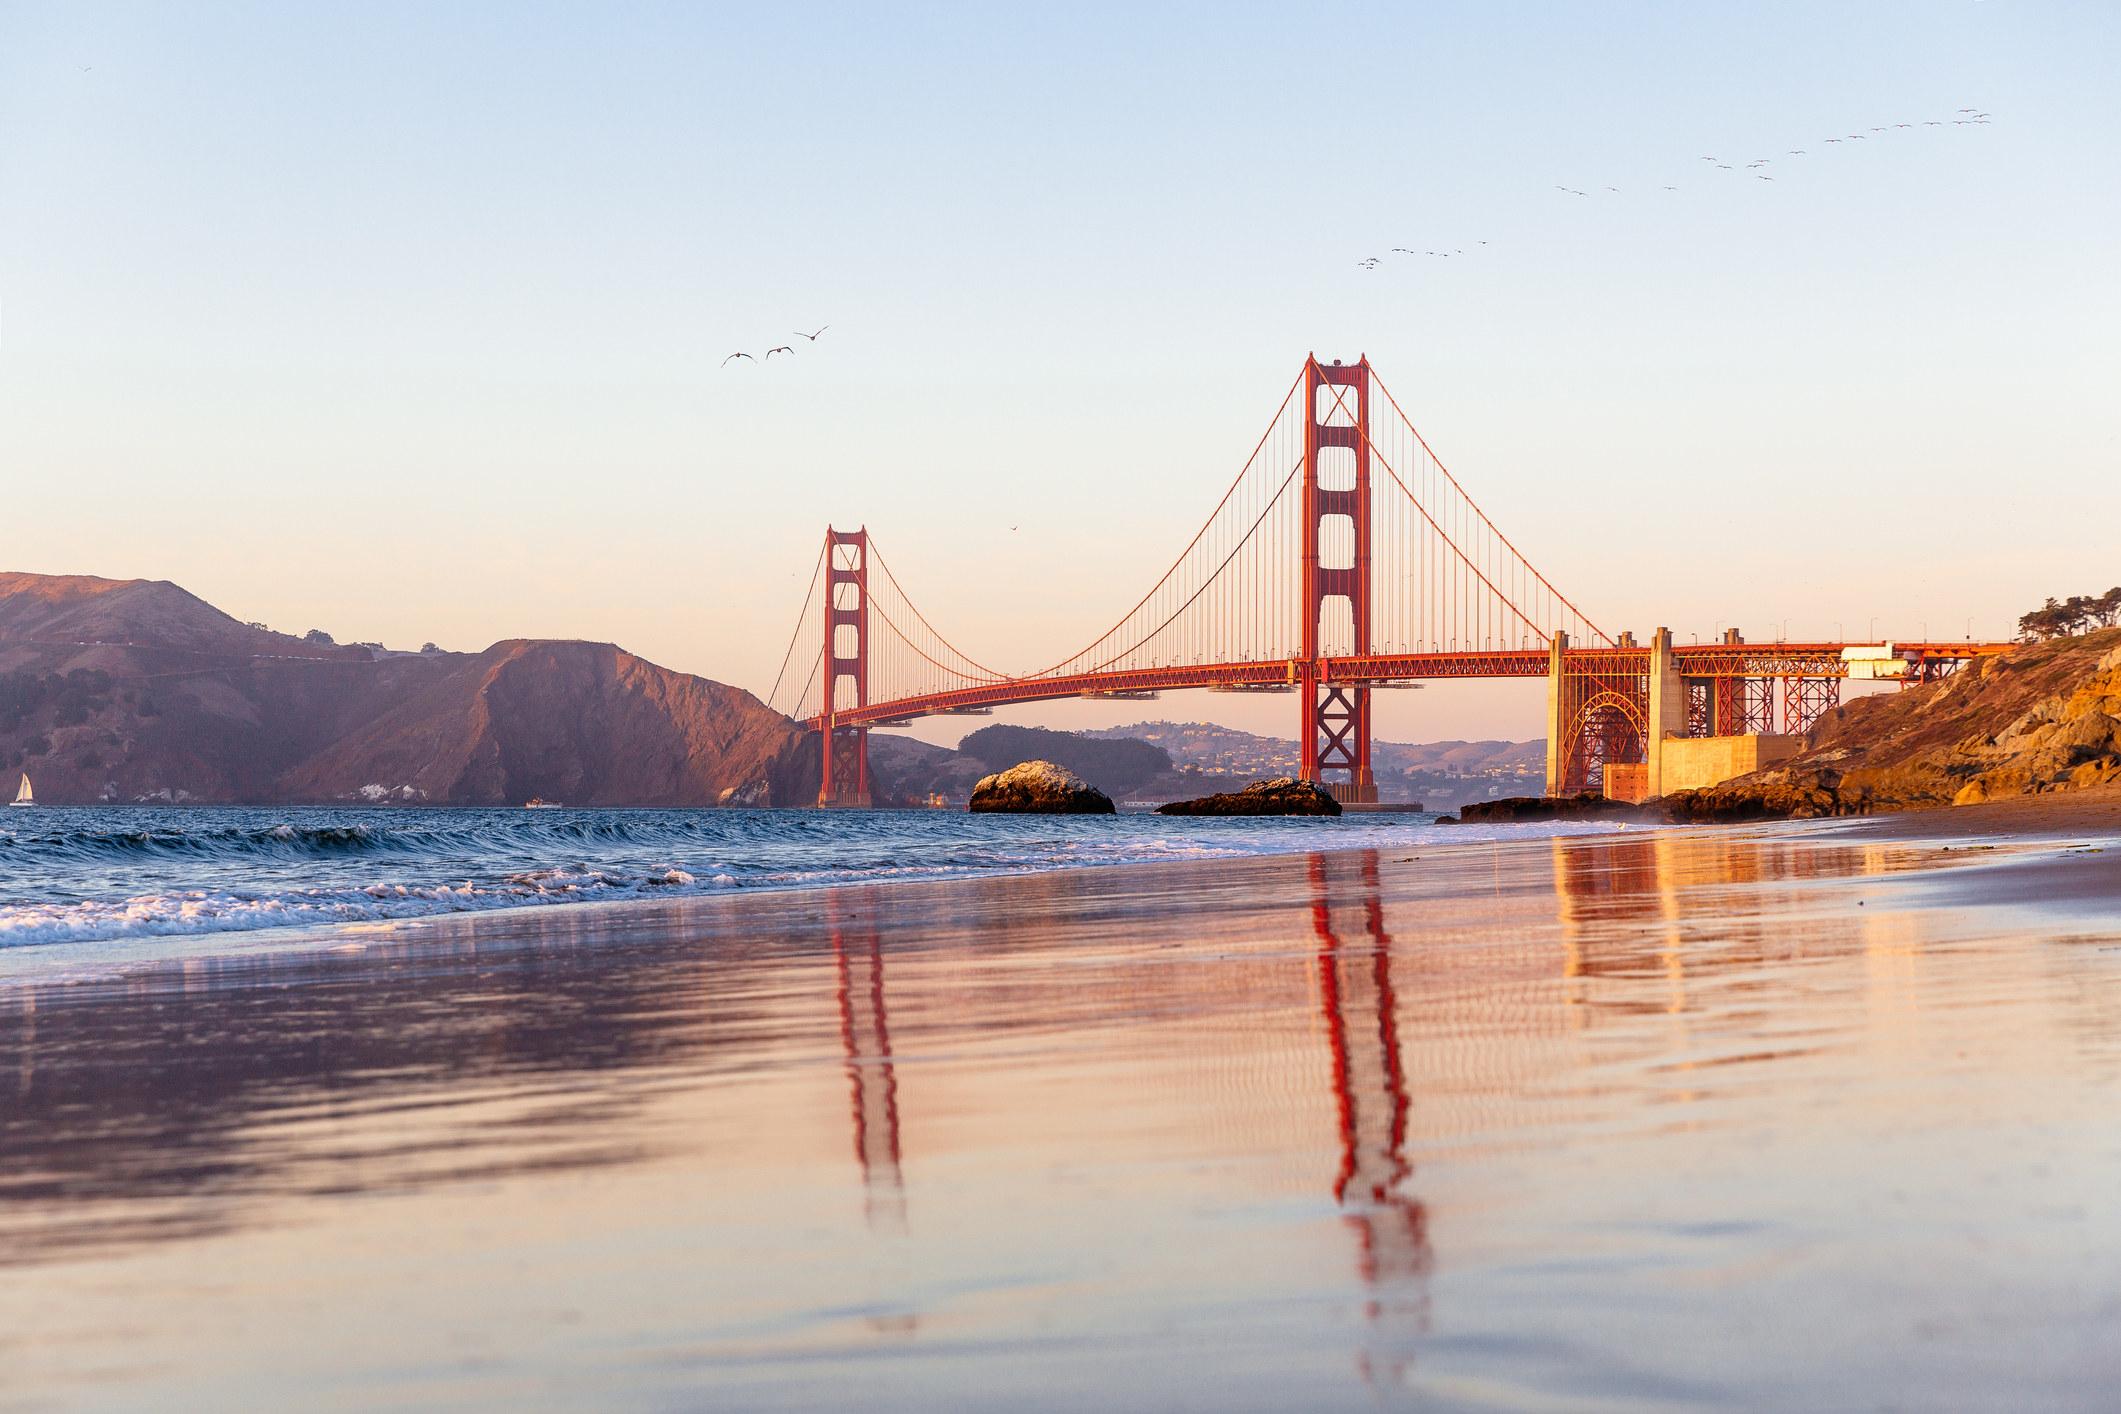 The Golden Gate Bridge in San Francsico.